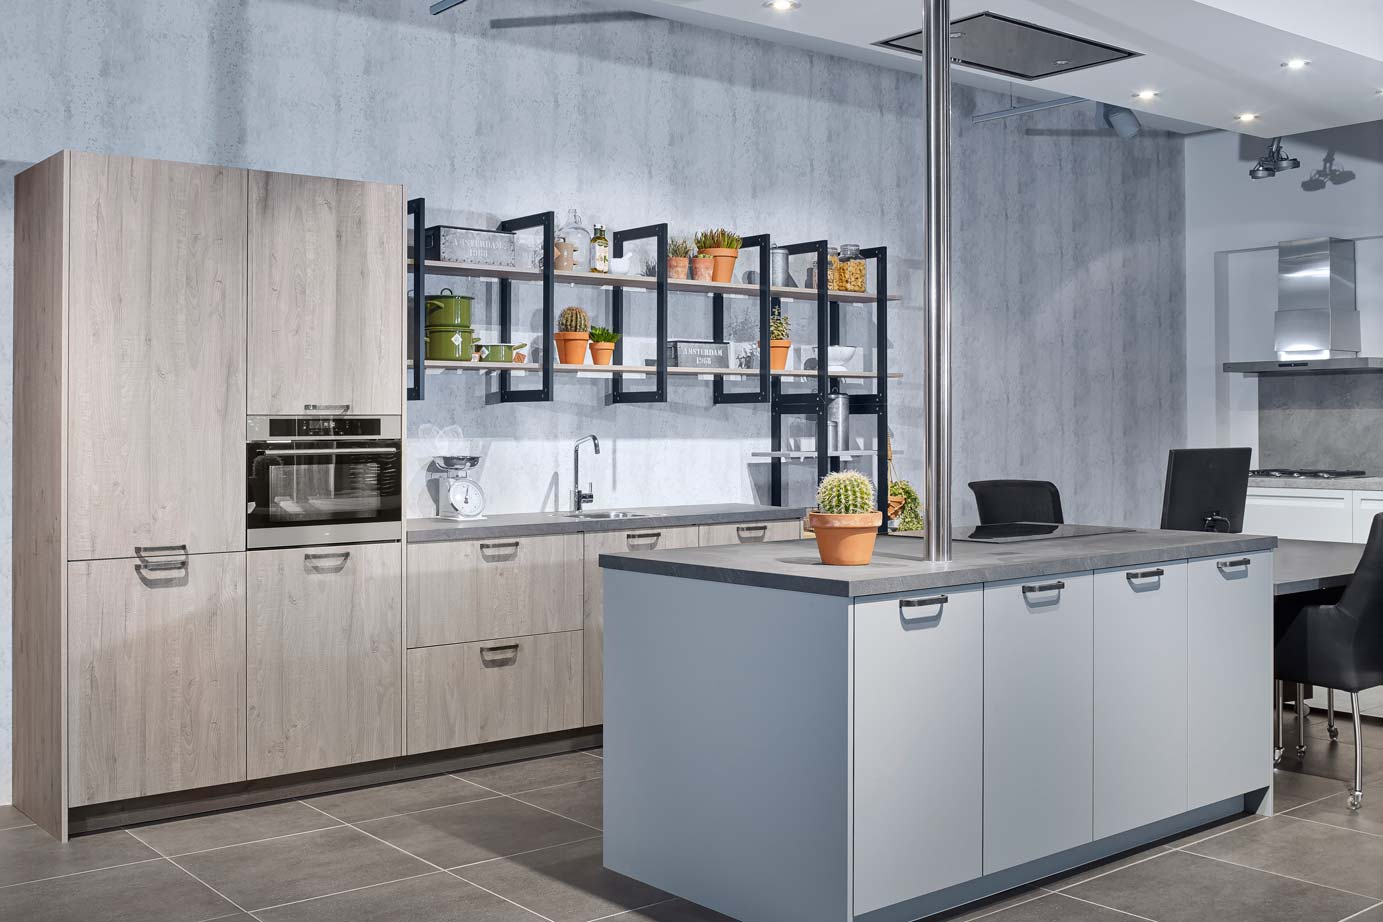 Industrieel Keuken Tegels : Modern industrieel kookeiland bekijk foto s en prijzen db keukens